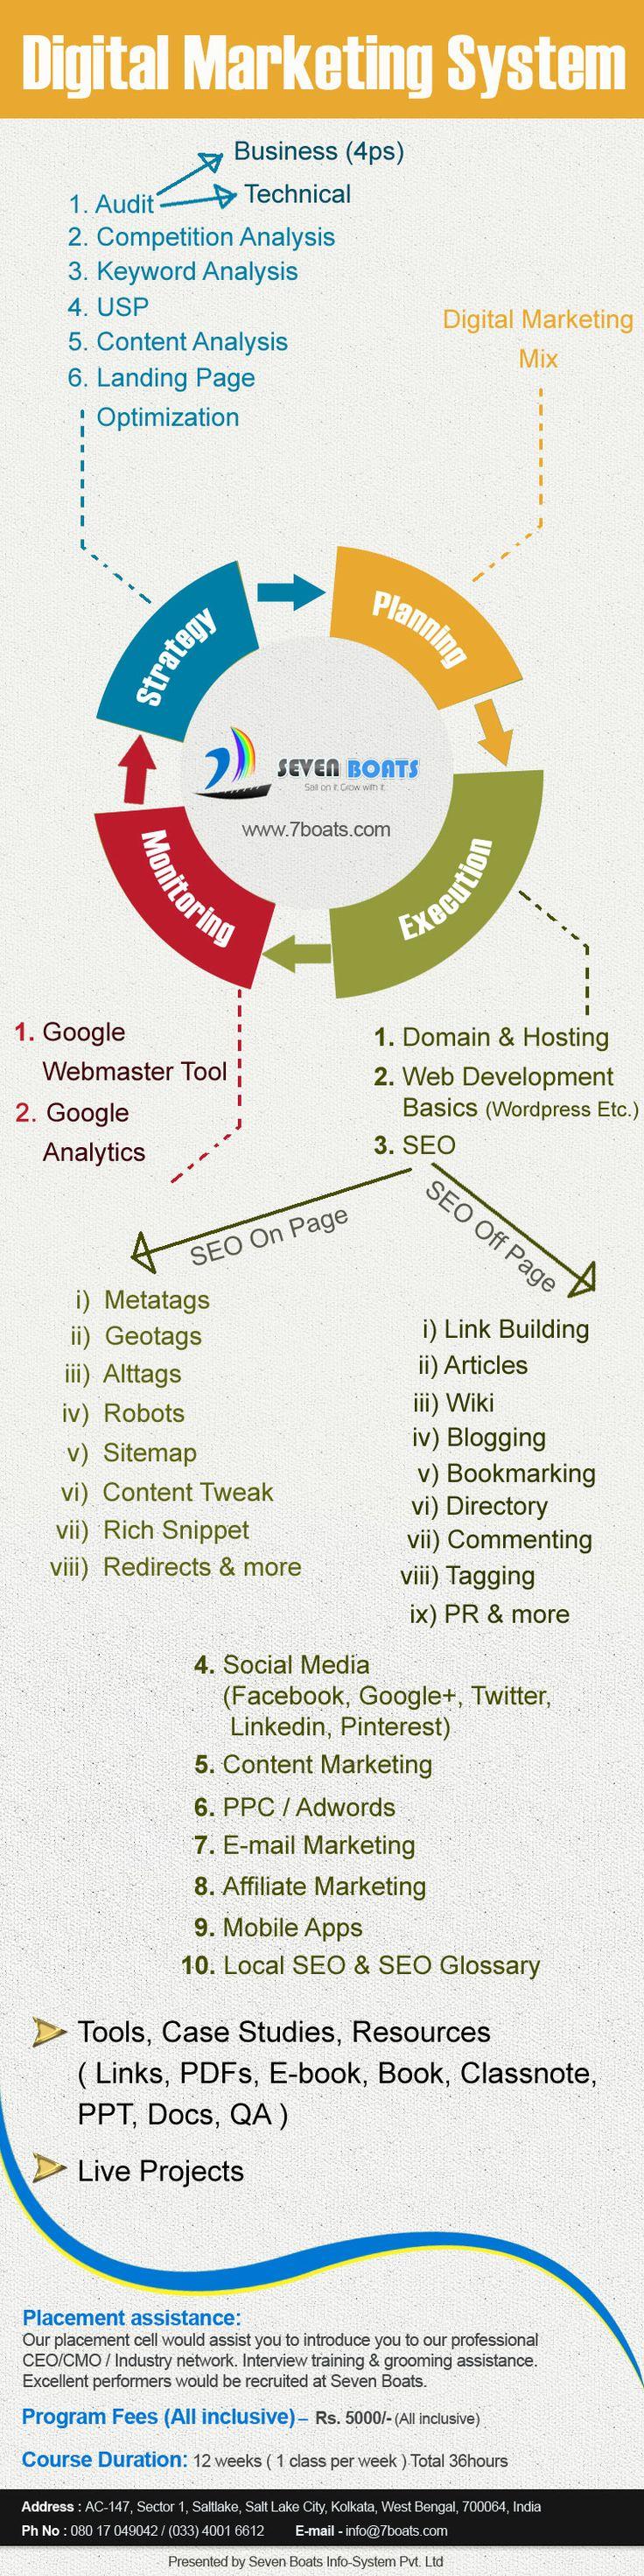 Internet Marketing Training, SEO Training Program, Digital Marketing Courses